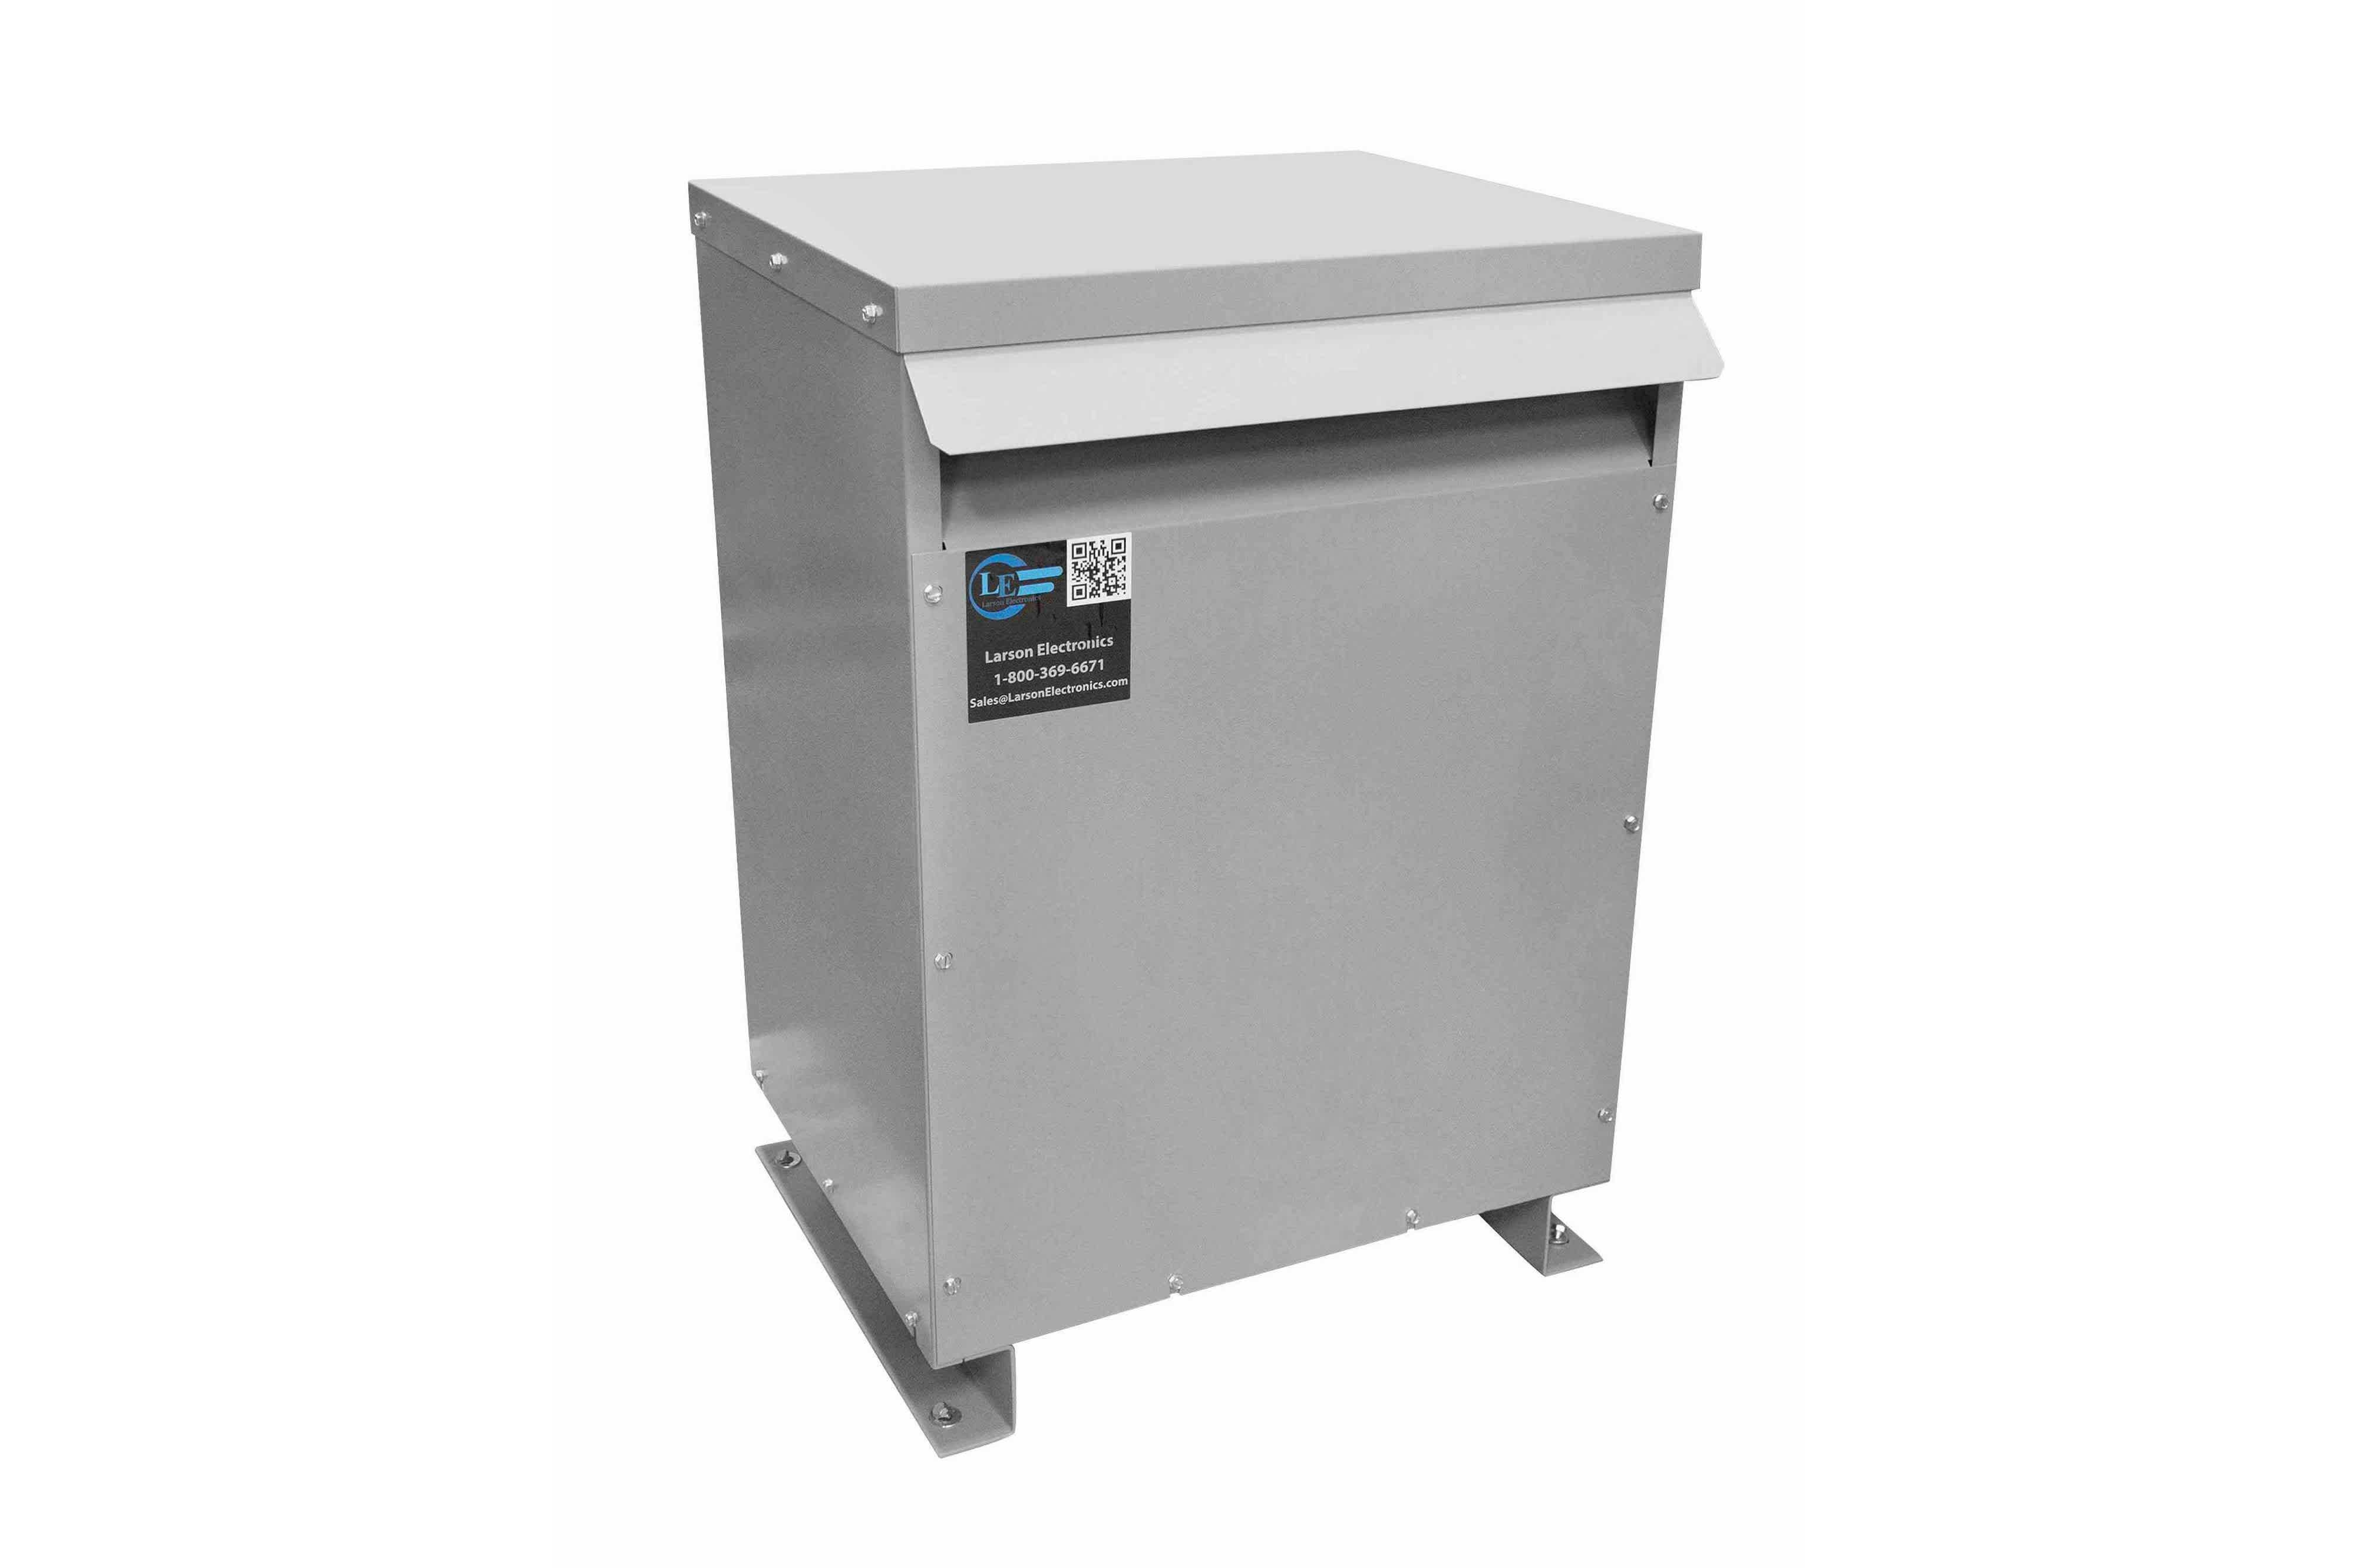 38 kVA 3PH Isolation Transformer, 220V Wye Primary, 480V Delta Secondary, N3R, Ventilated, 60 Hz